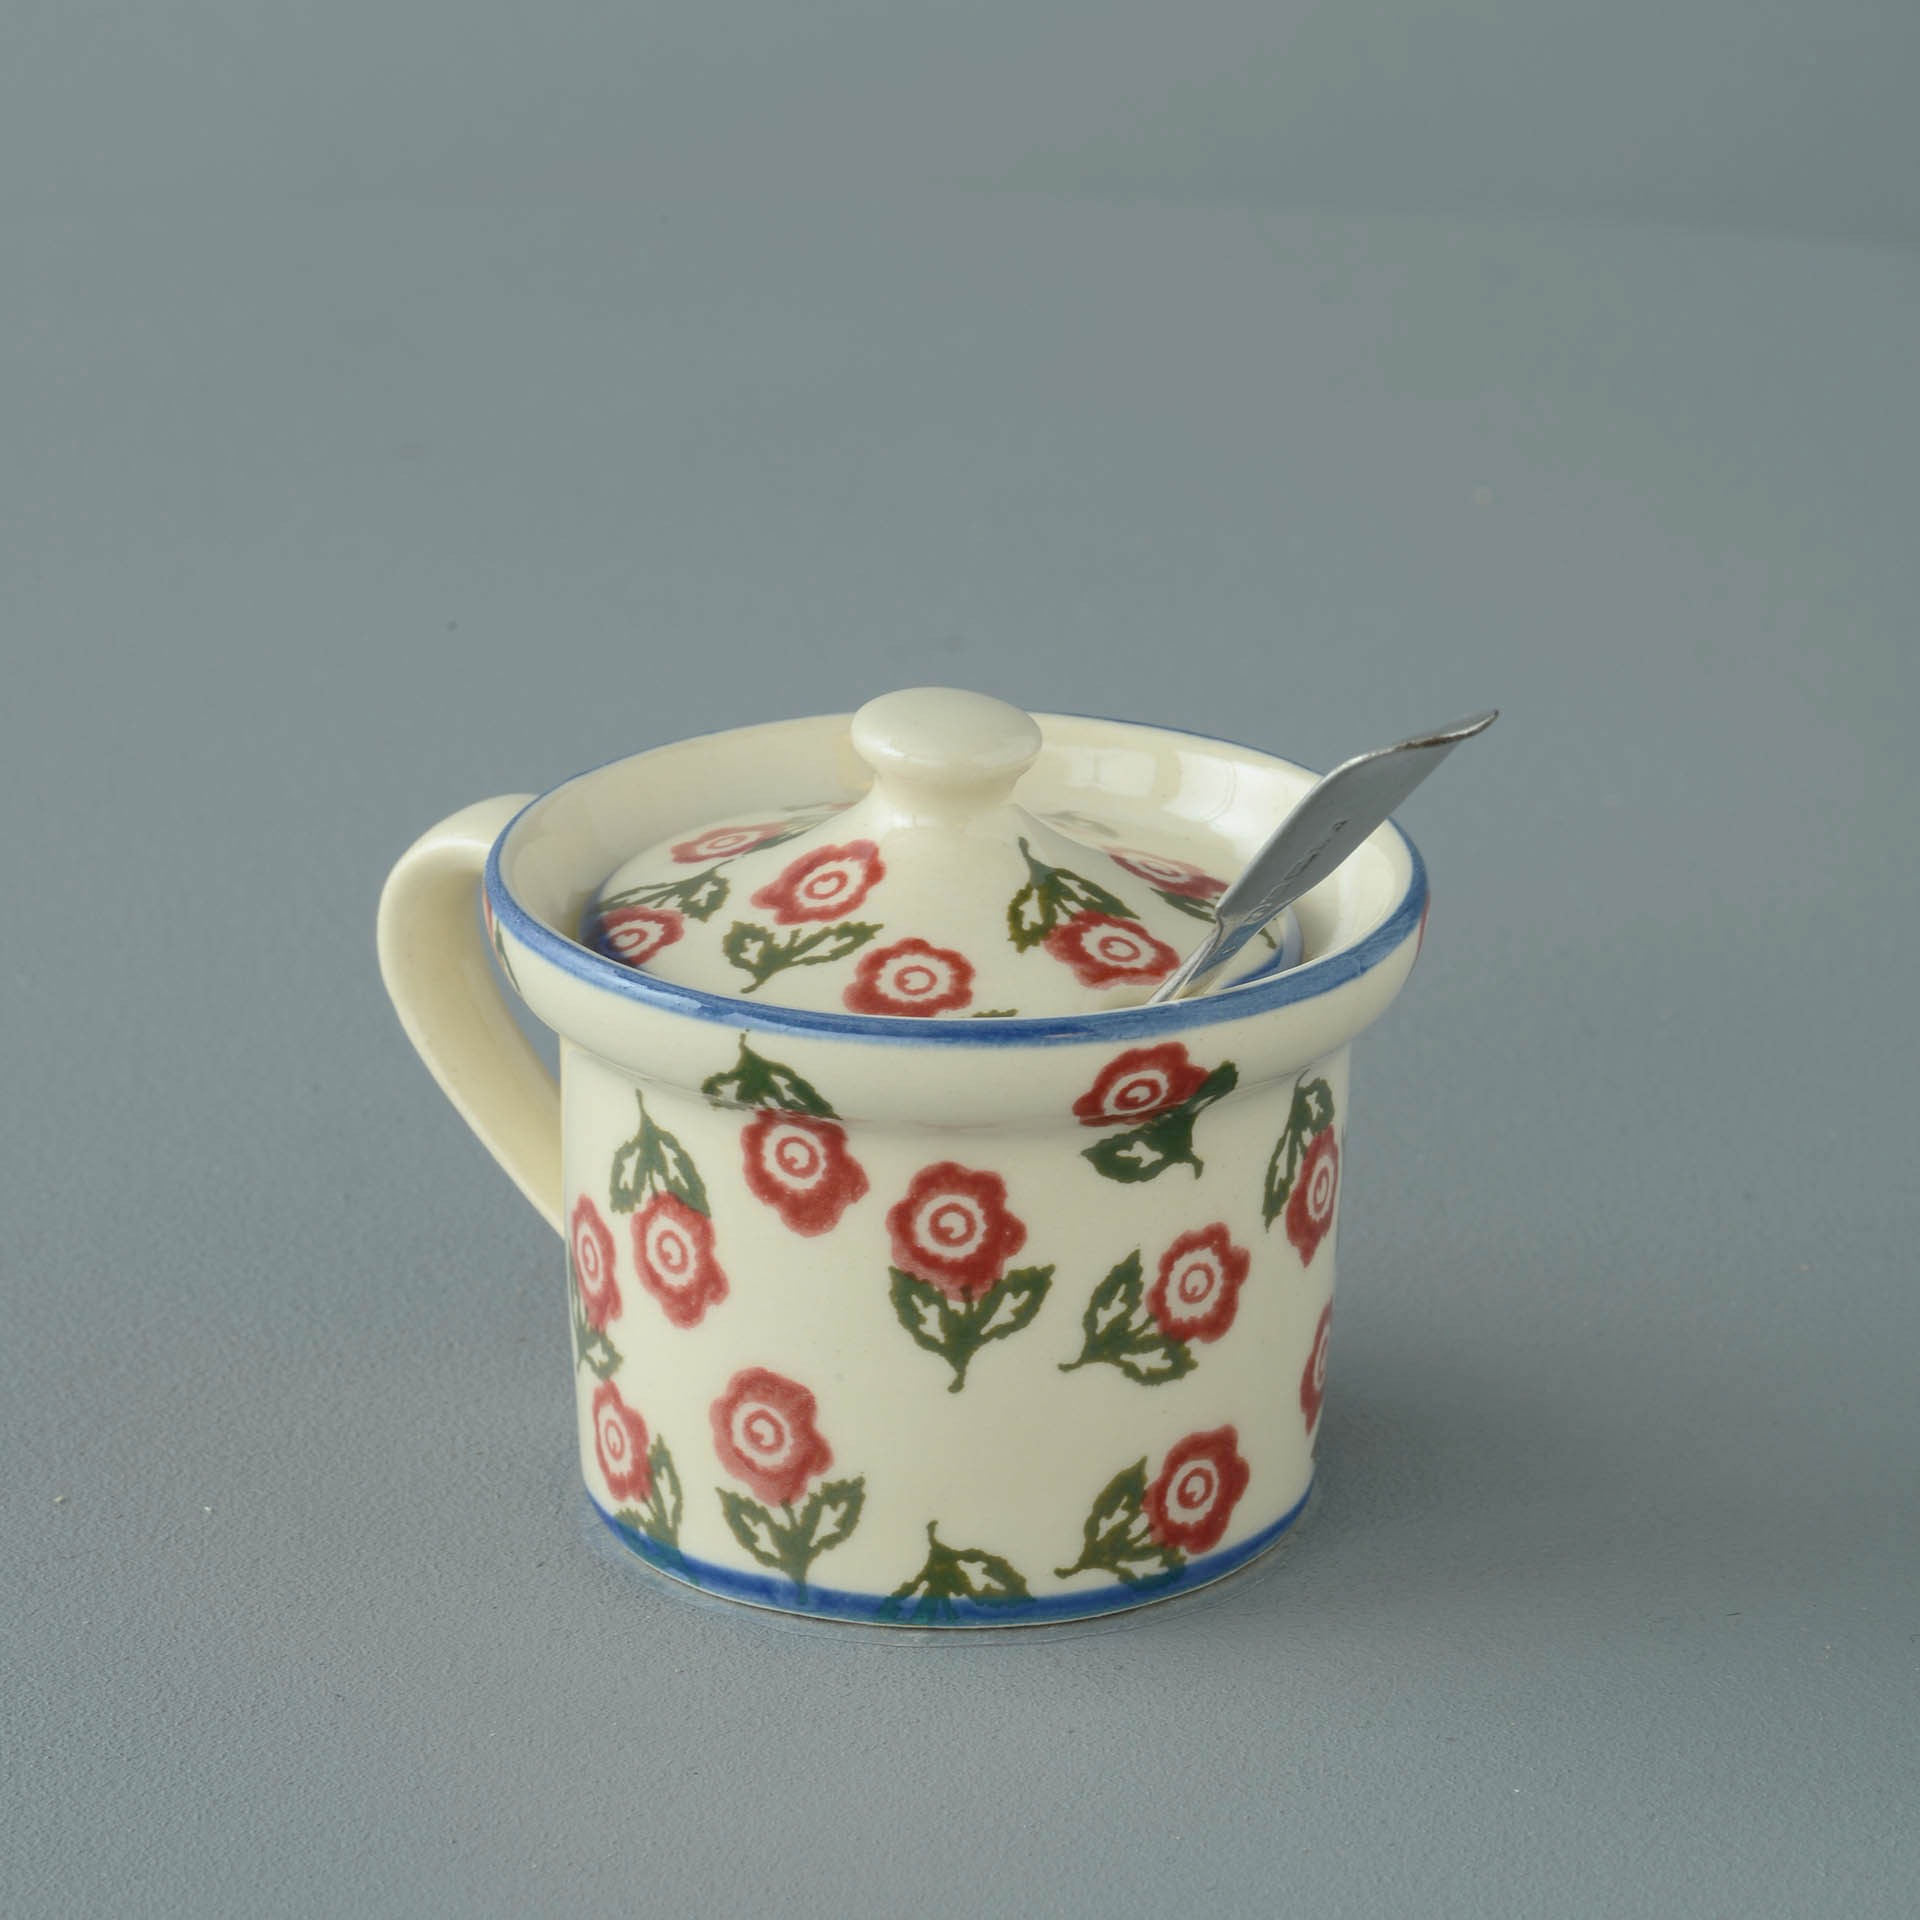 Scattered Rose Mustard Pot 7.8(w) x 5.4(h) cm